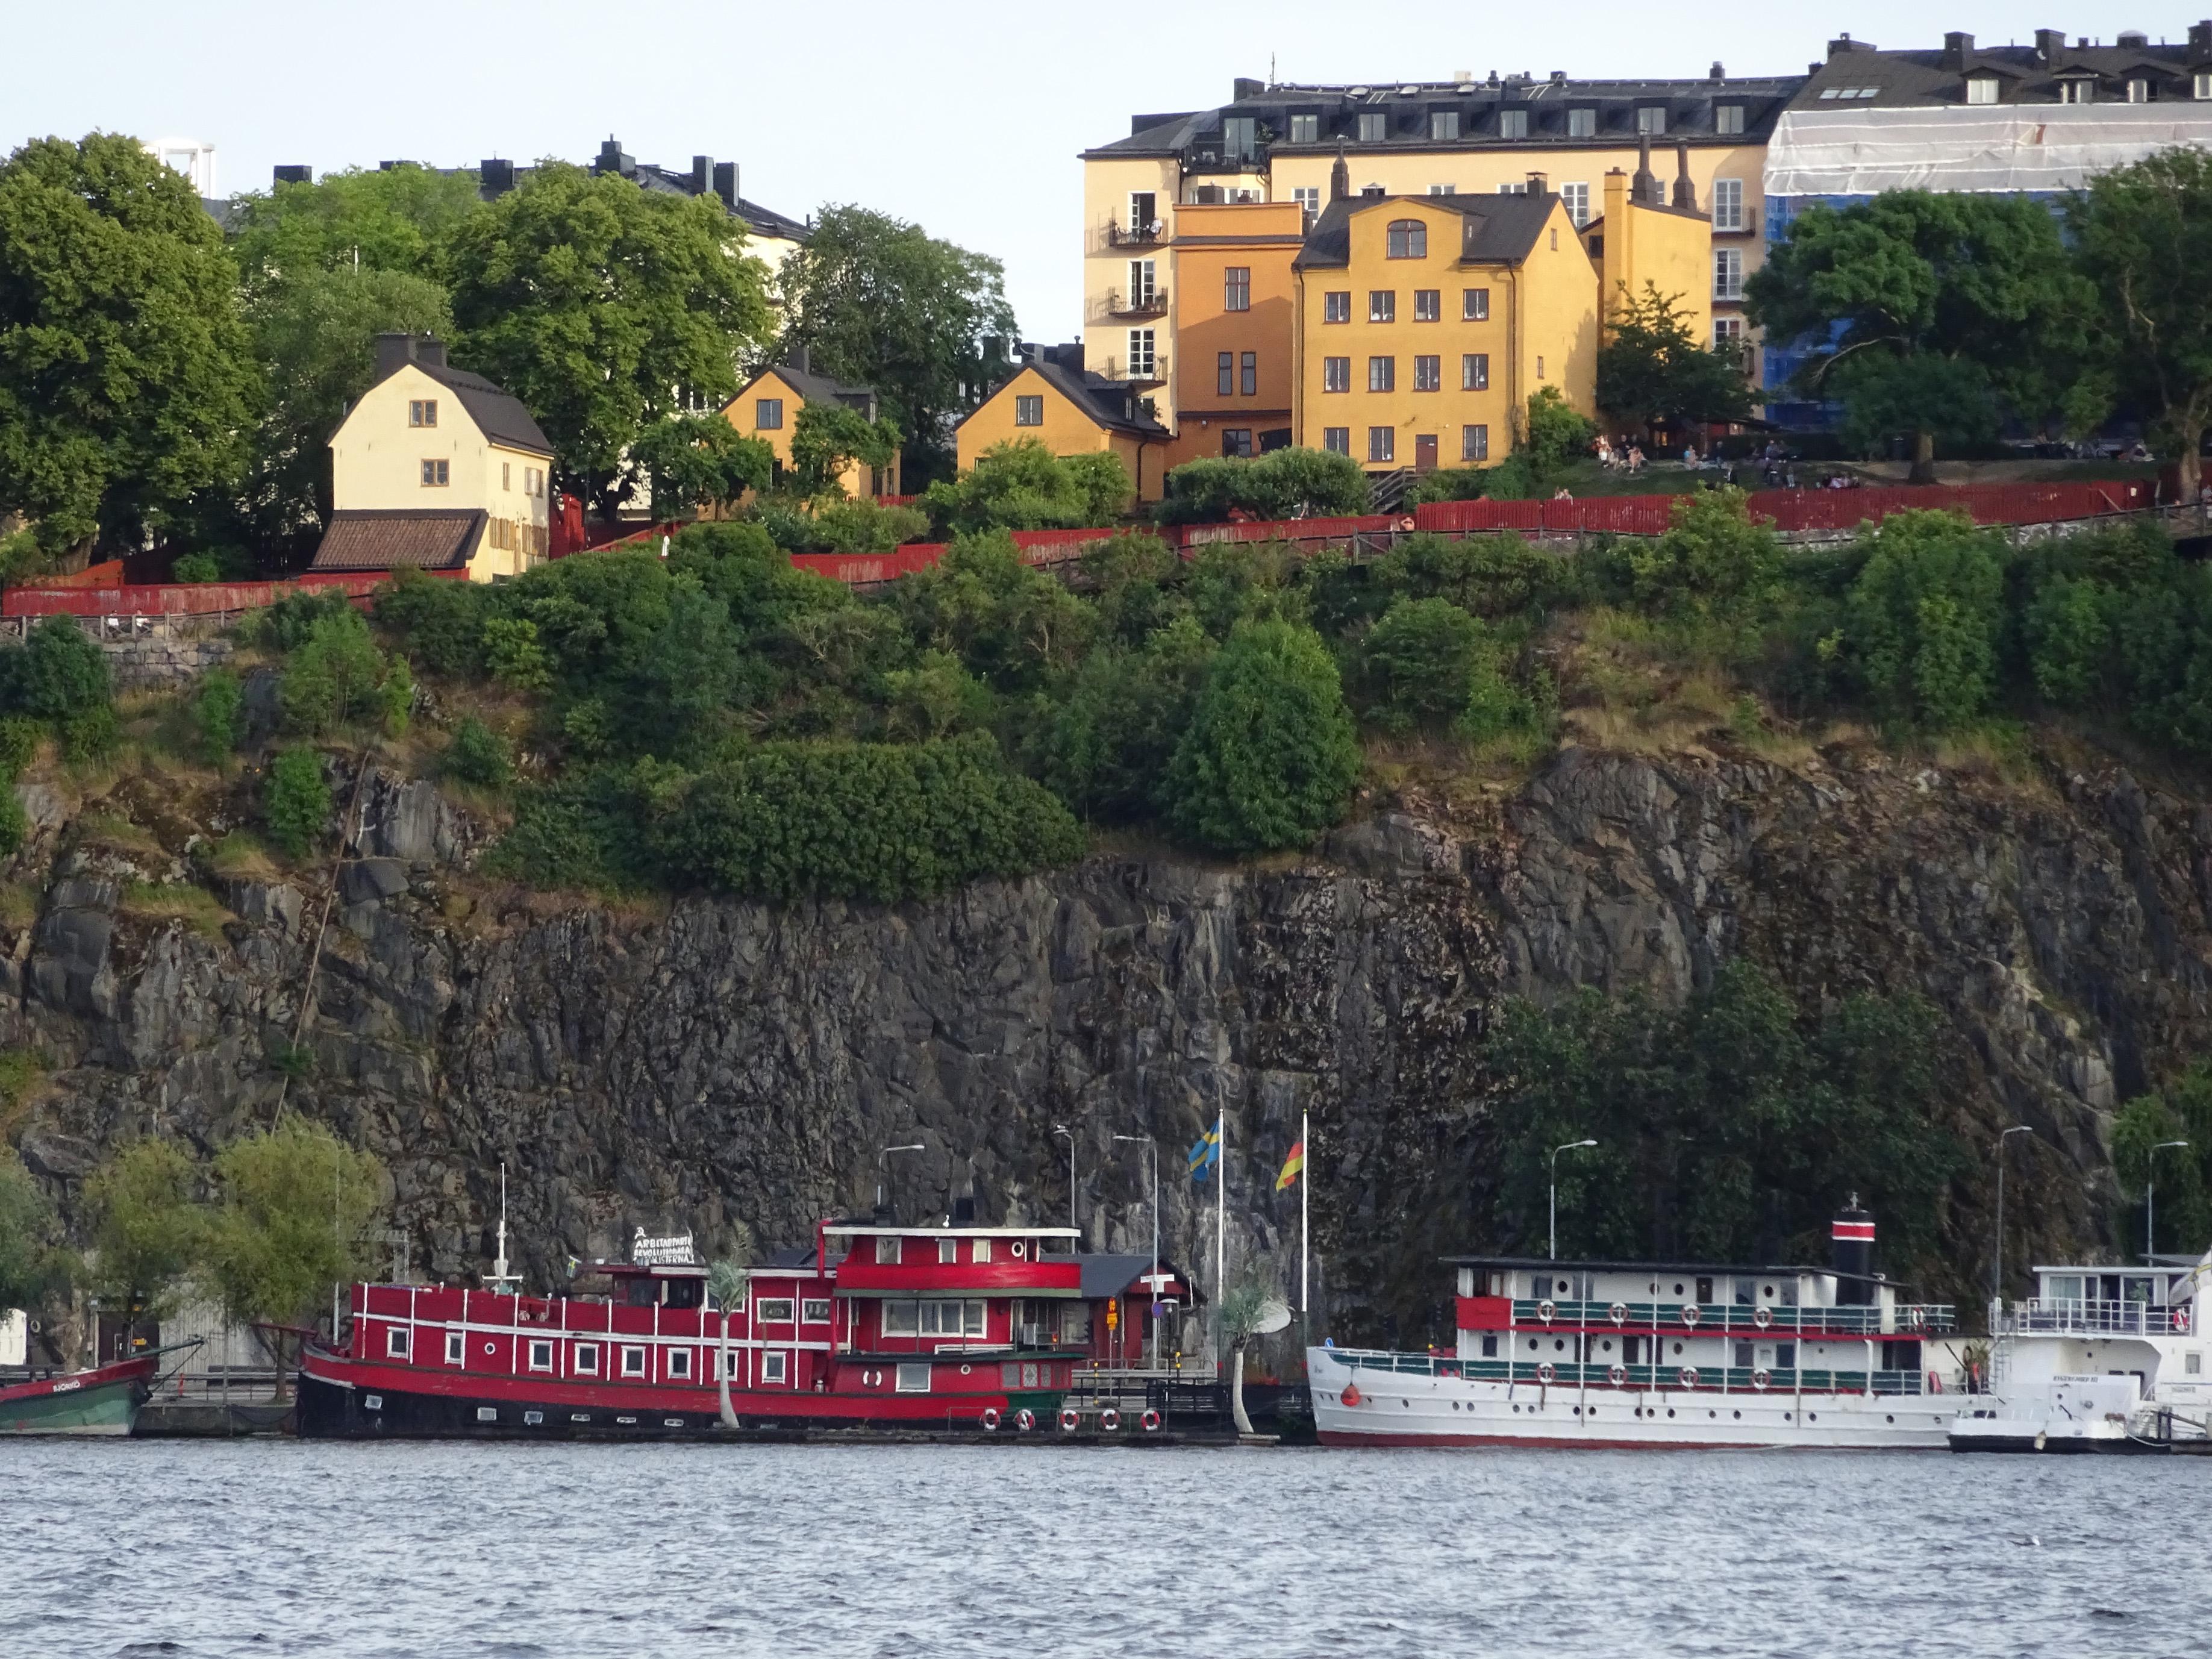 blog_d14s04_stockholm_057.jpg